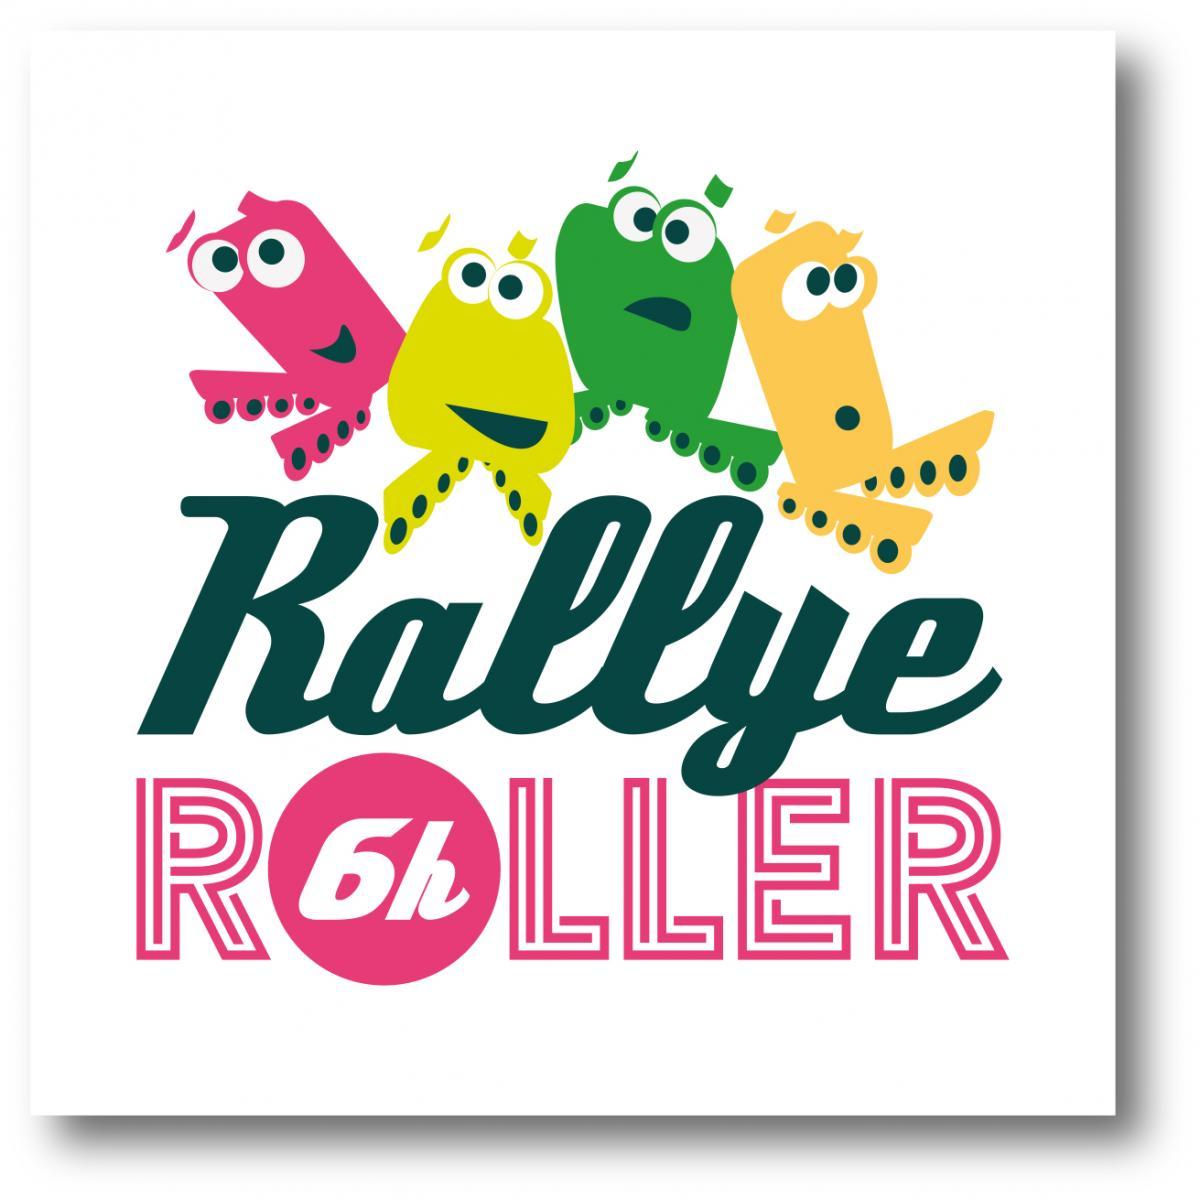 Rallye 6H Roller 2020